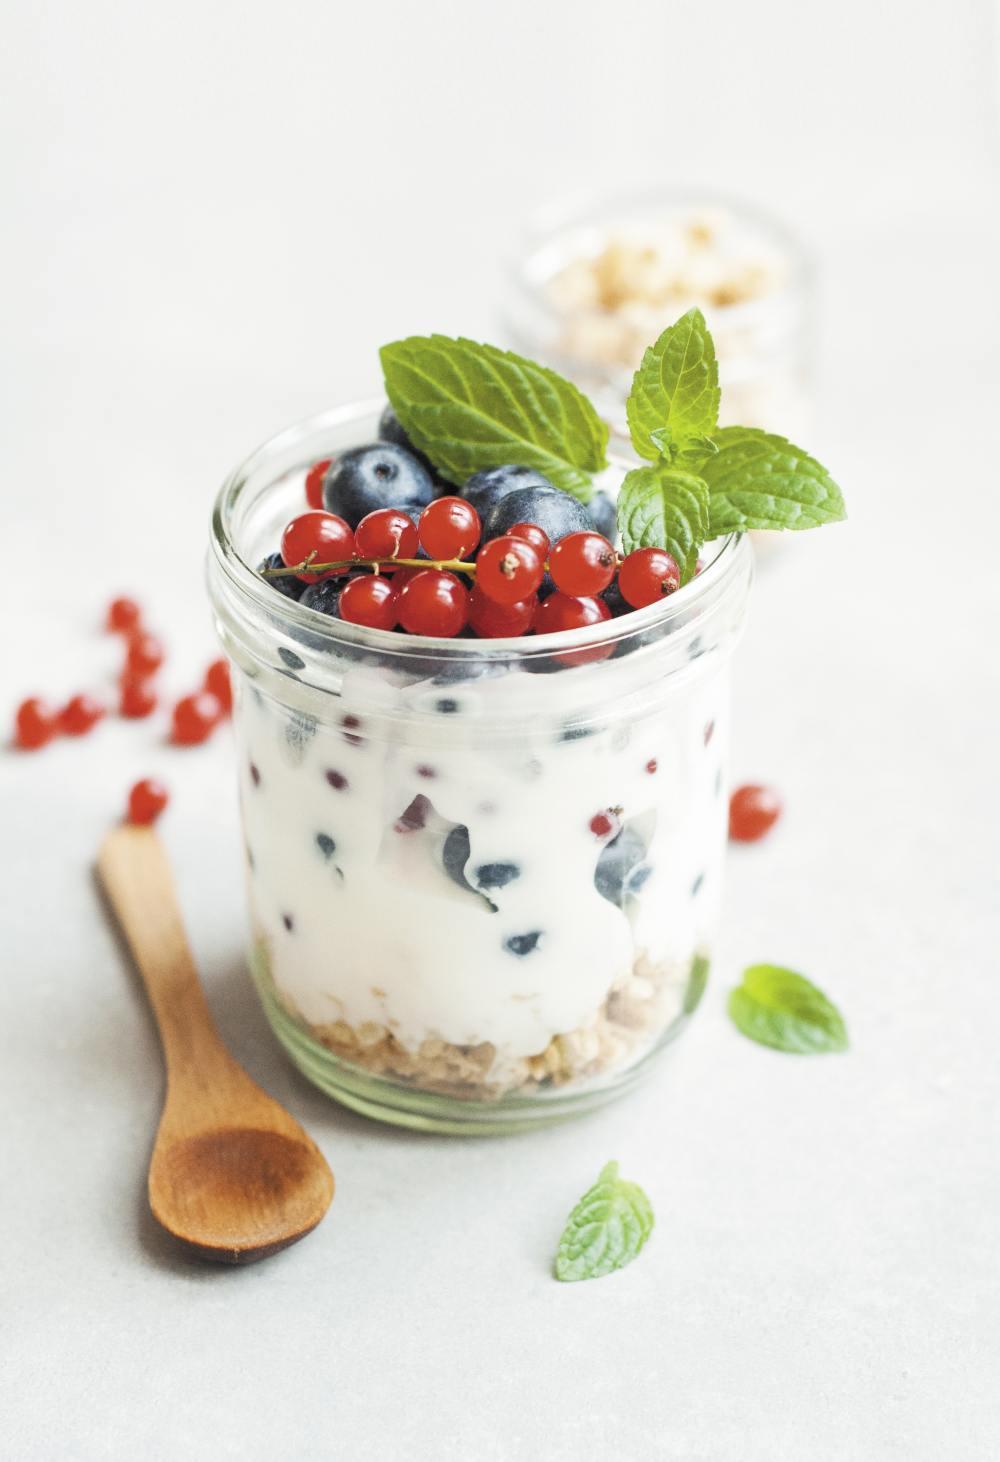 bowl-breakfast-calcium-cereal-414262.jpg